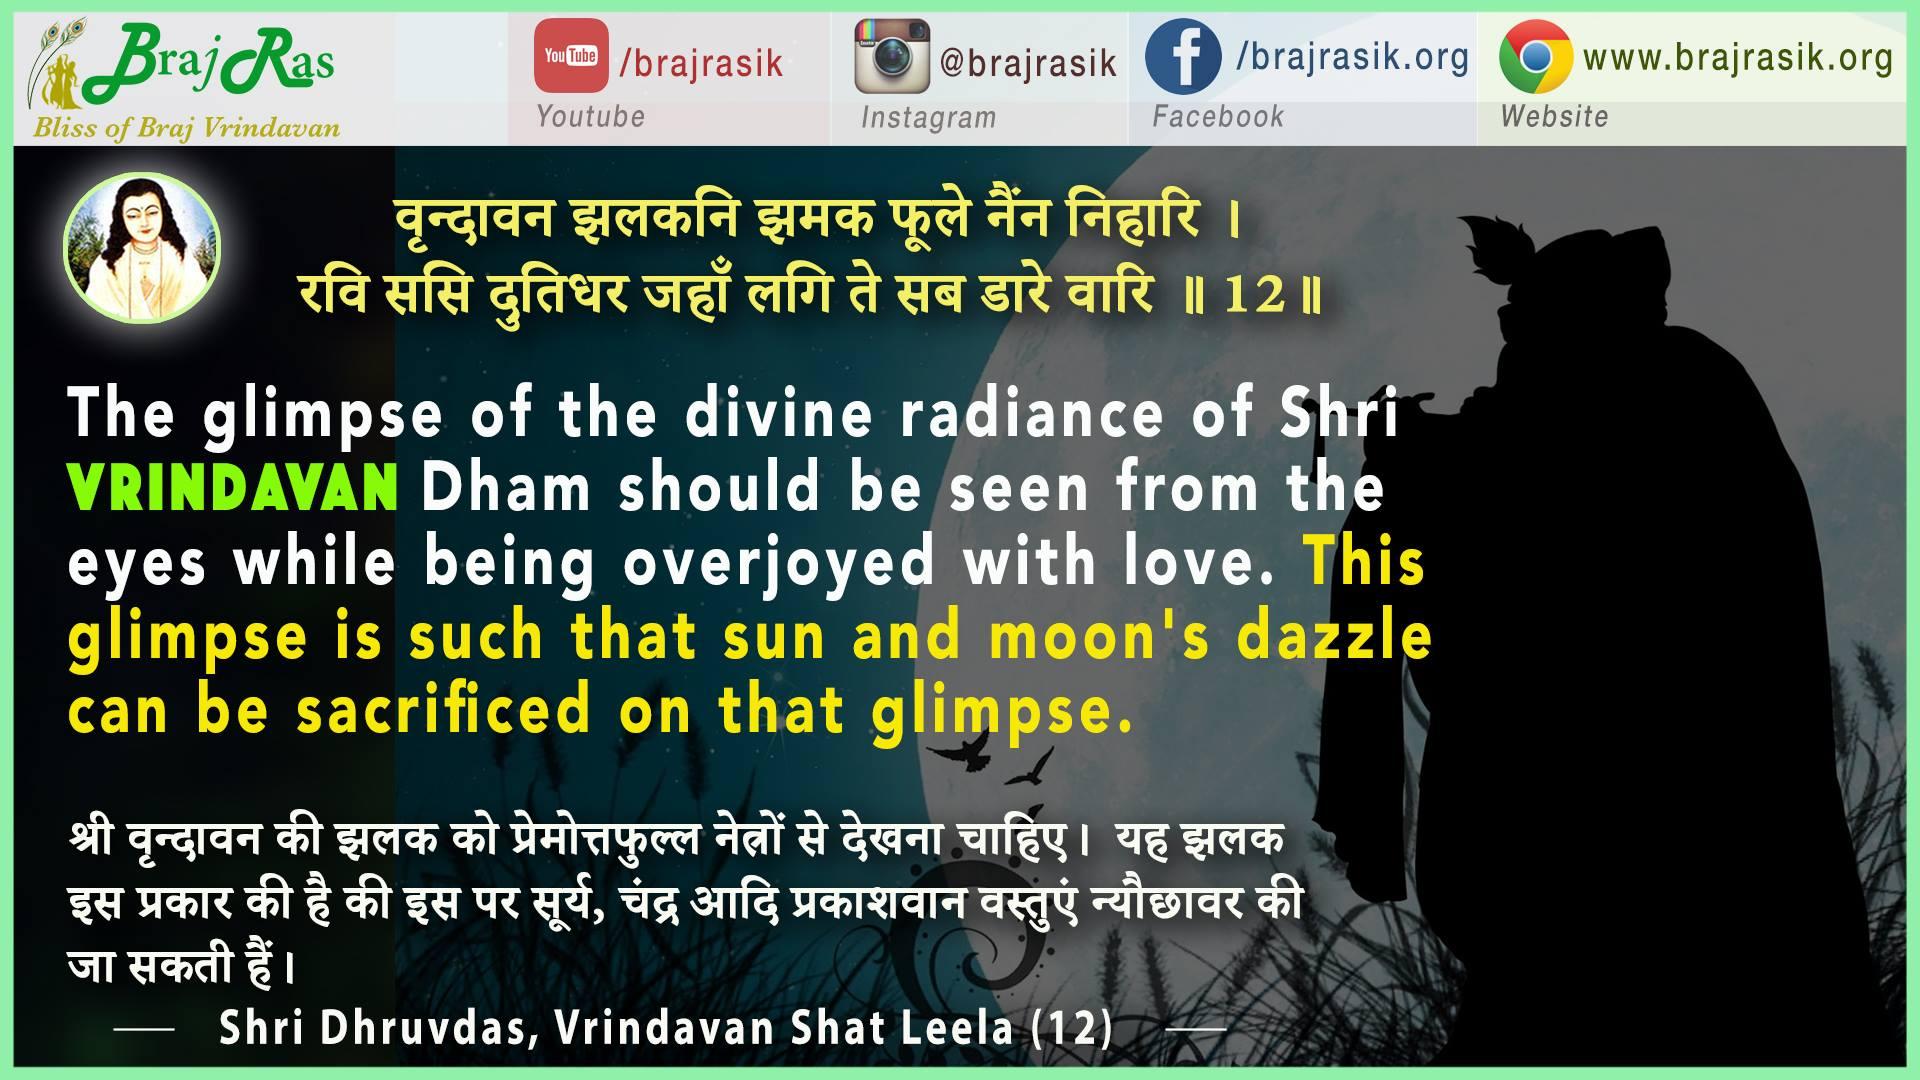 Vrindavan Jhalakani Jhamak Phoole Nain Nihari - Shri Dhruvdas, Vrindavan Shat Leela (12)